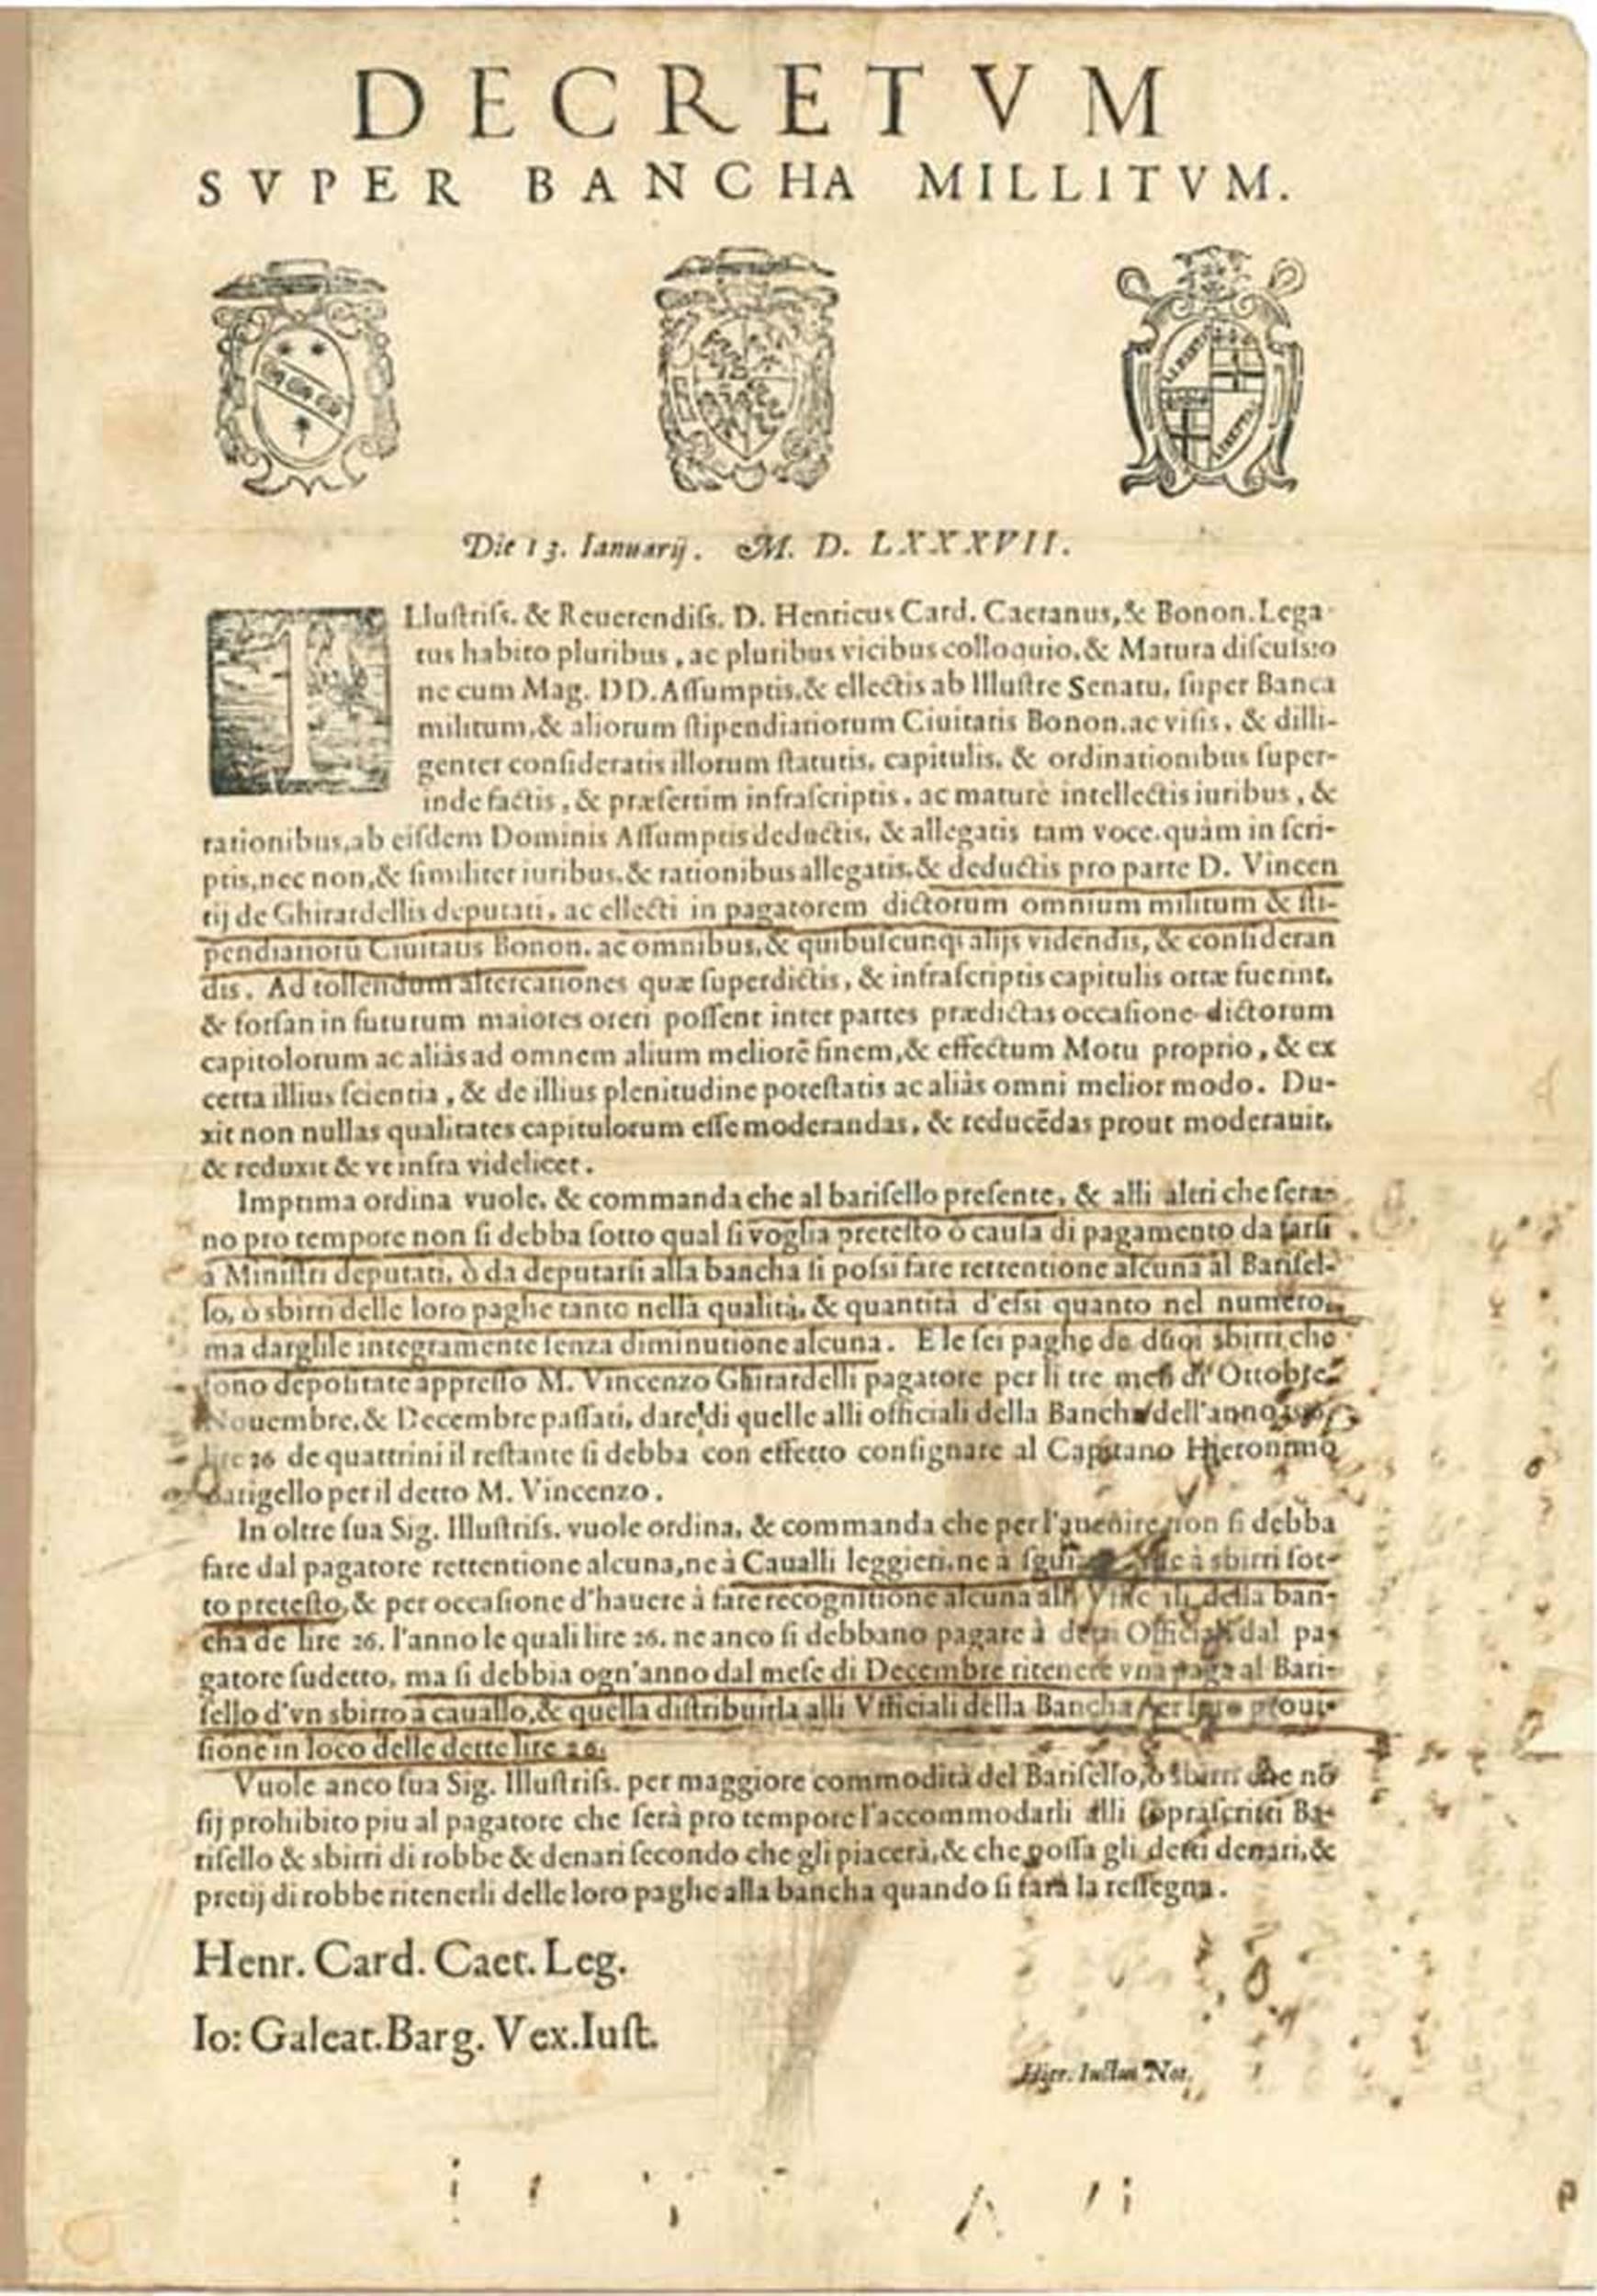 Decorative 16th Century Printed Military Decree